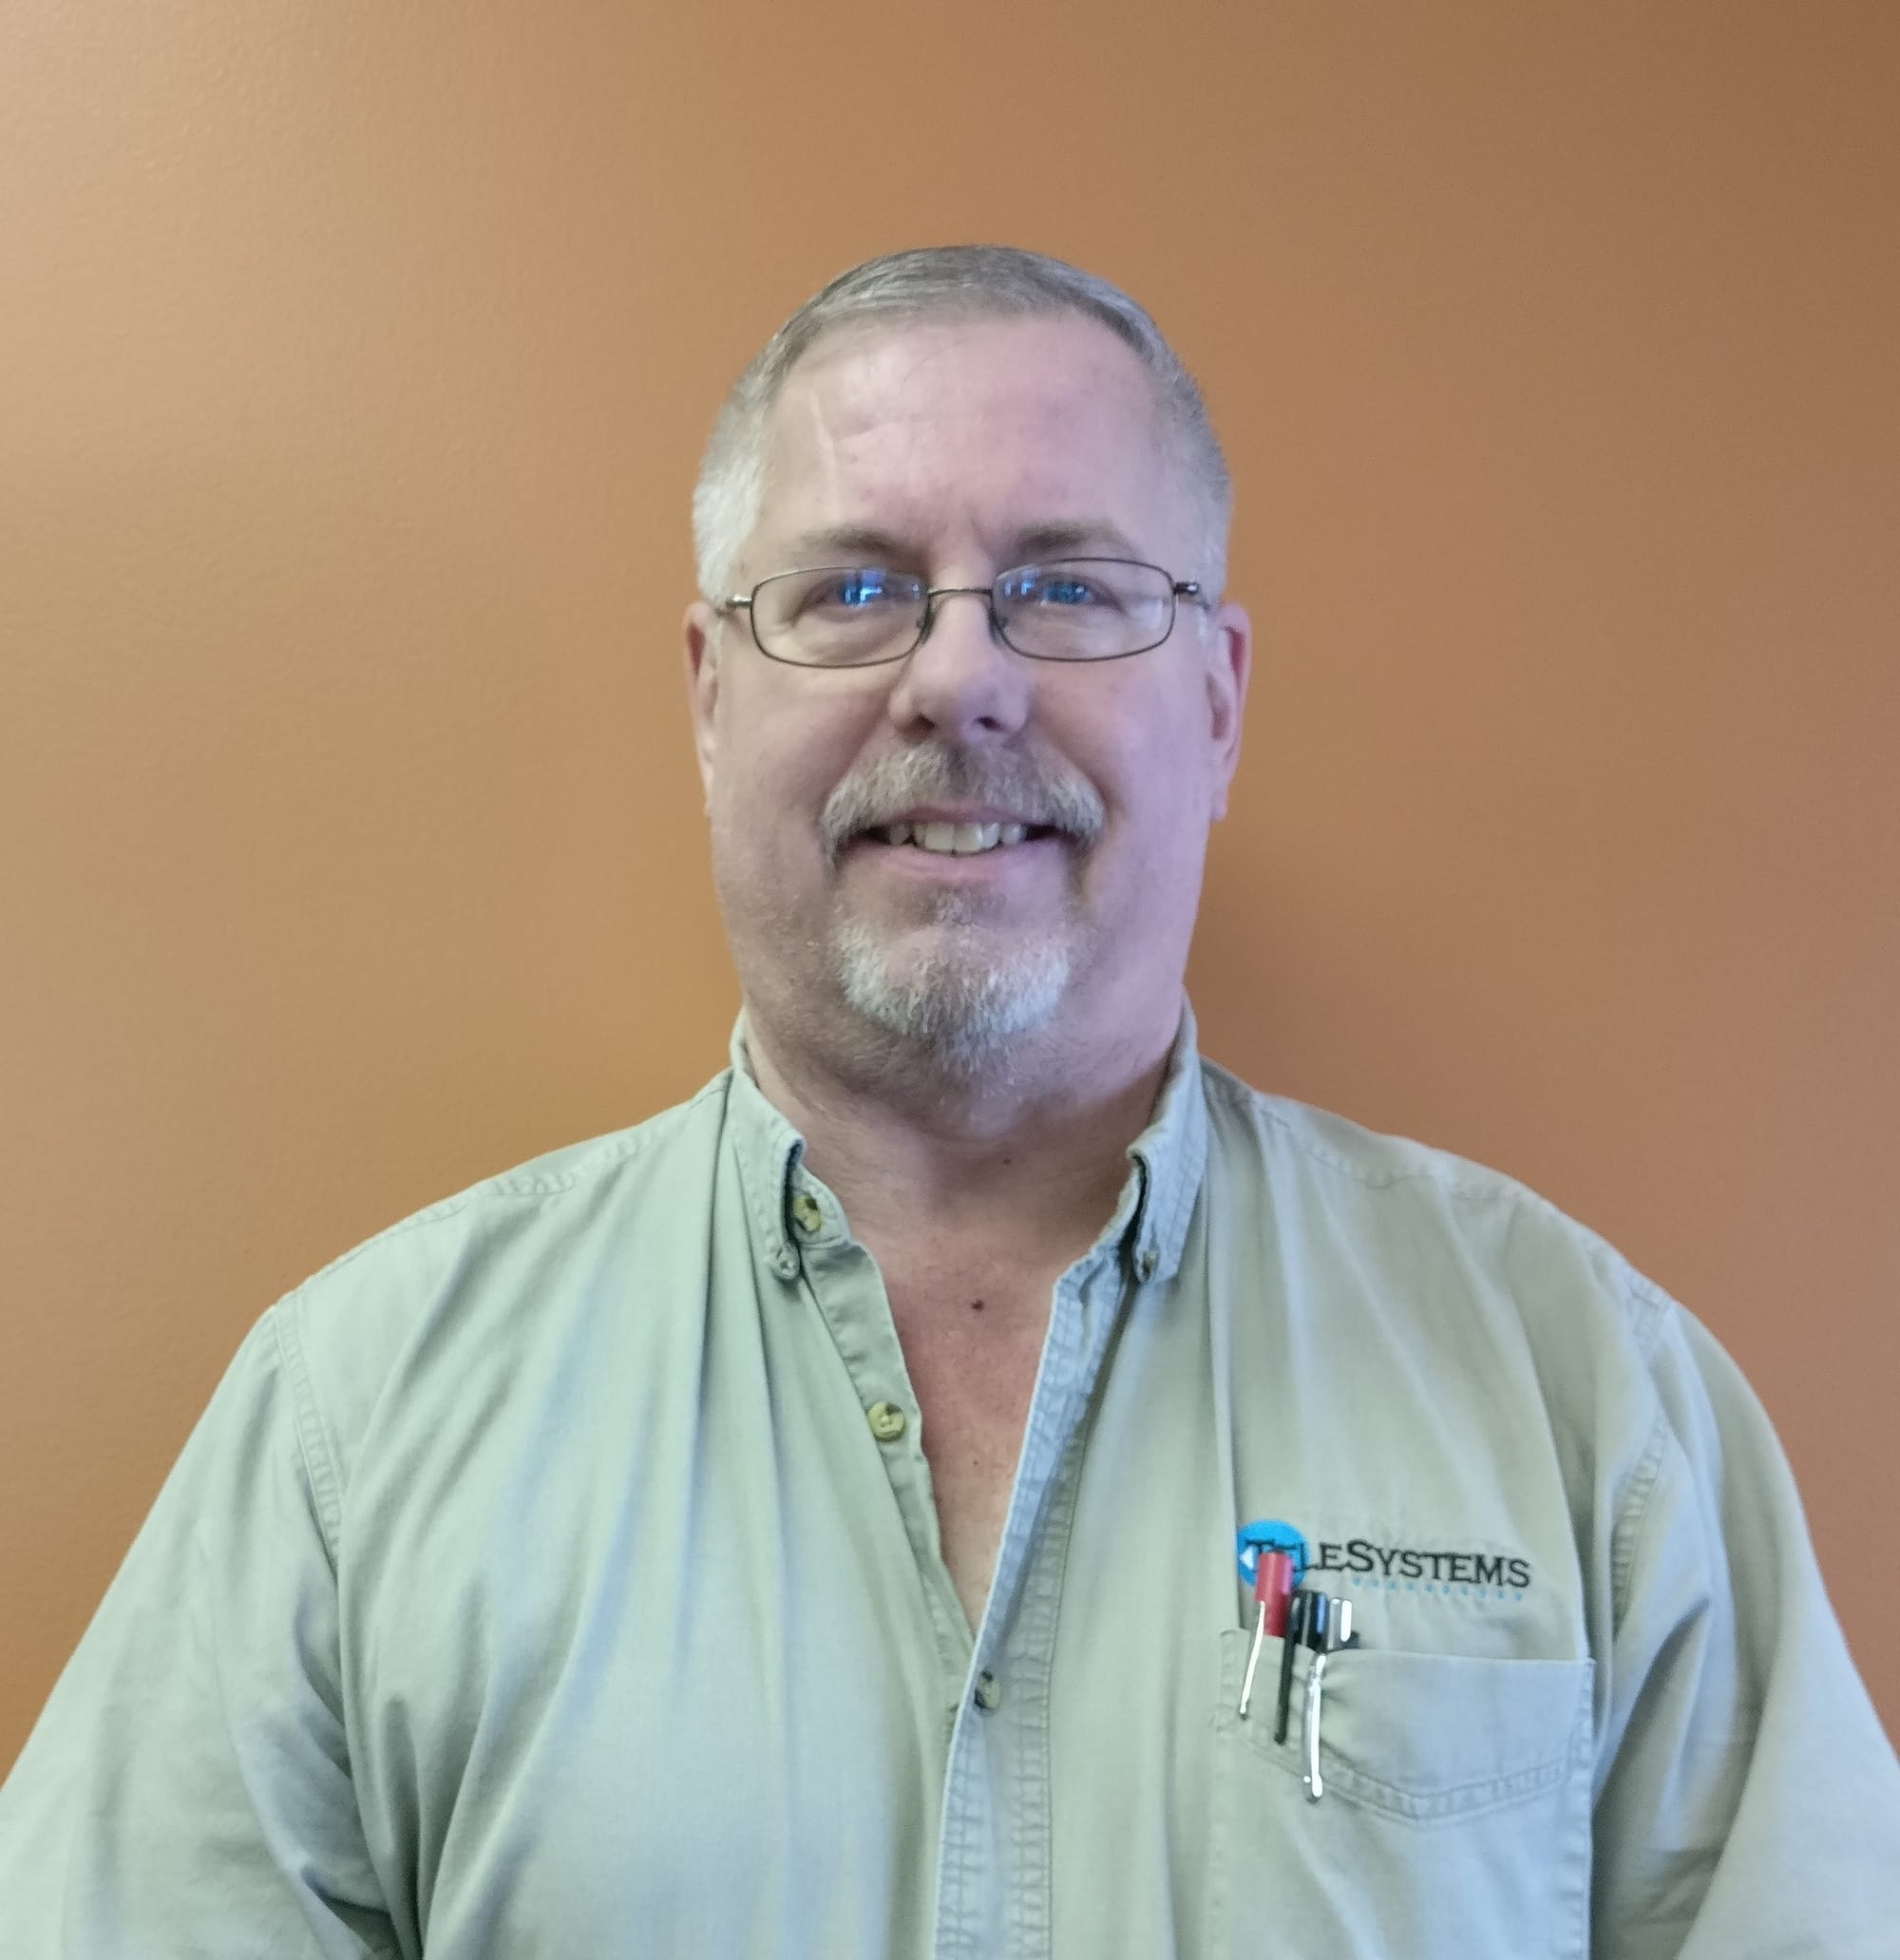 Meet the team: Bob Tingwald - Featured Image